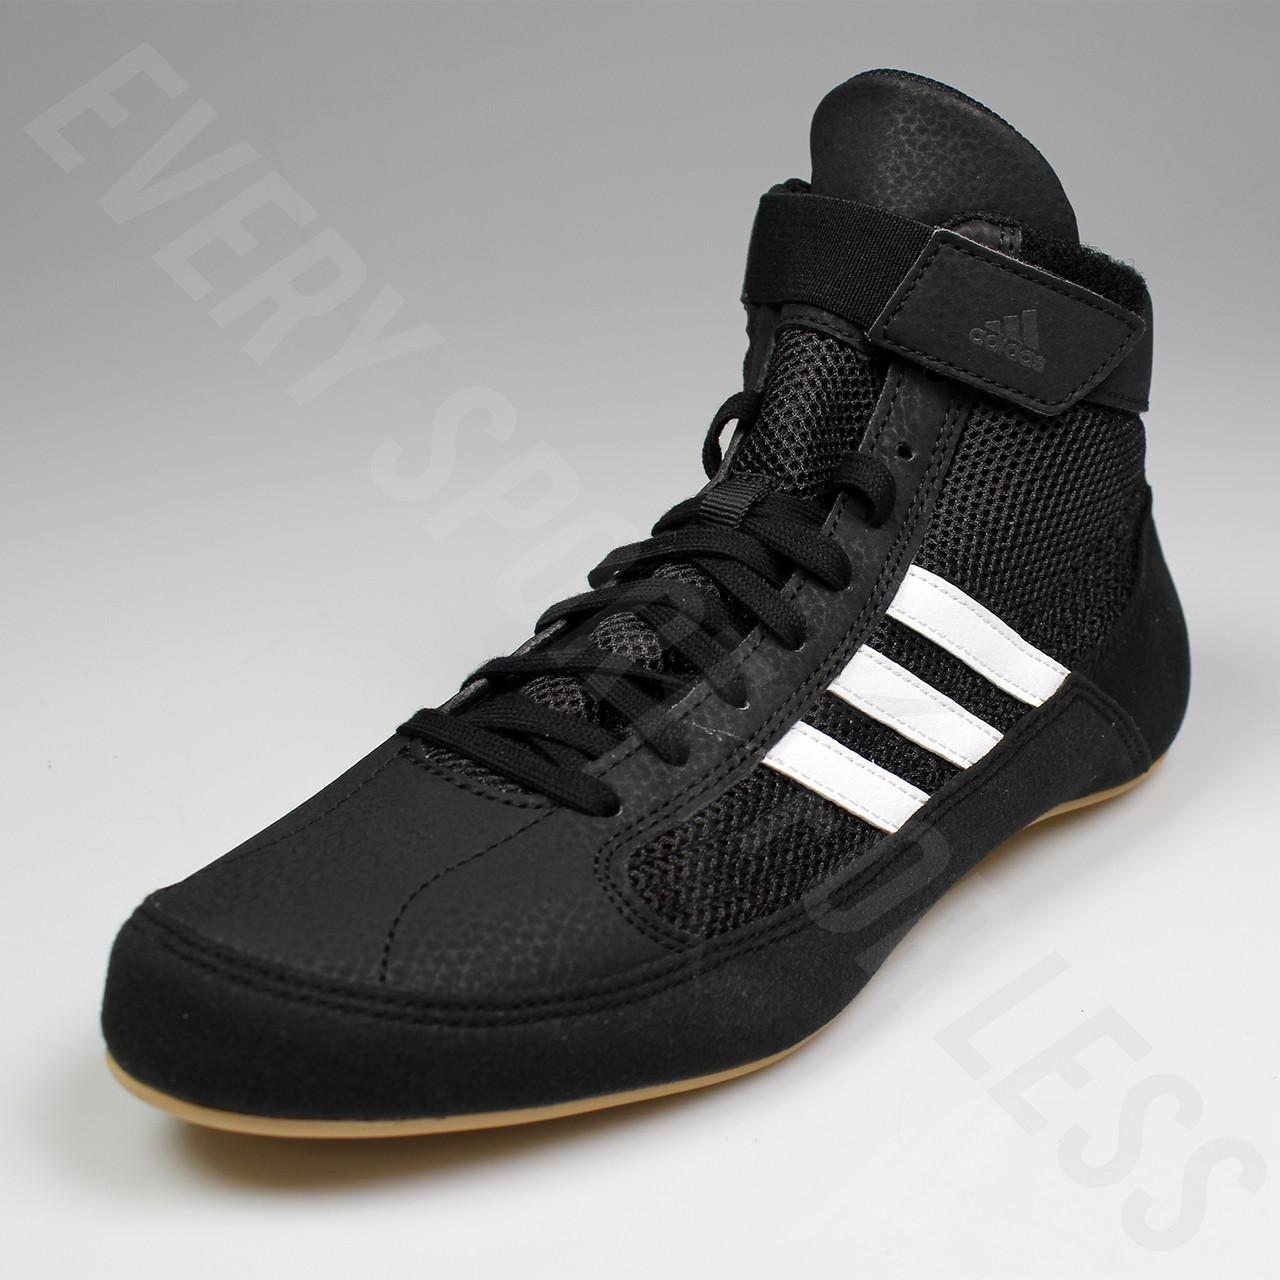 20106f6b97fd6a ... low price adidas hvc 2 youth wrestling shoes aq3327 black white 06022  19bb7